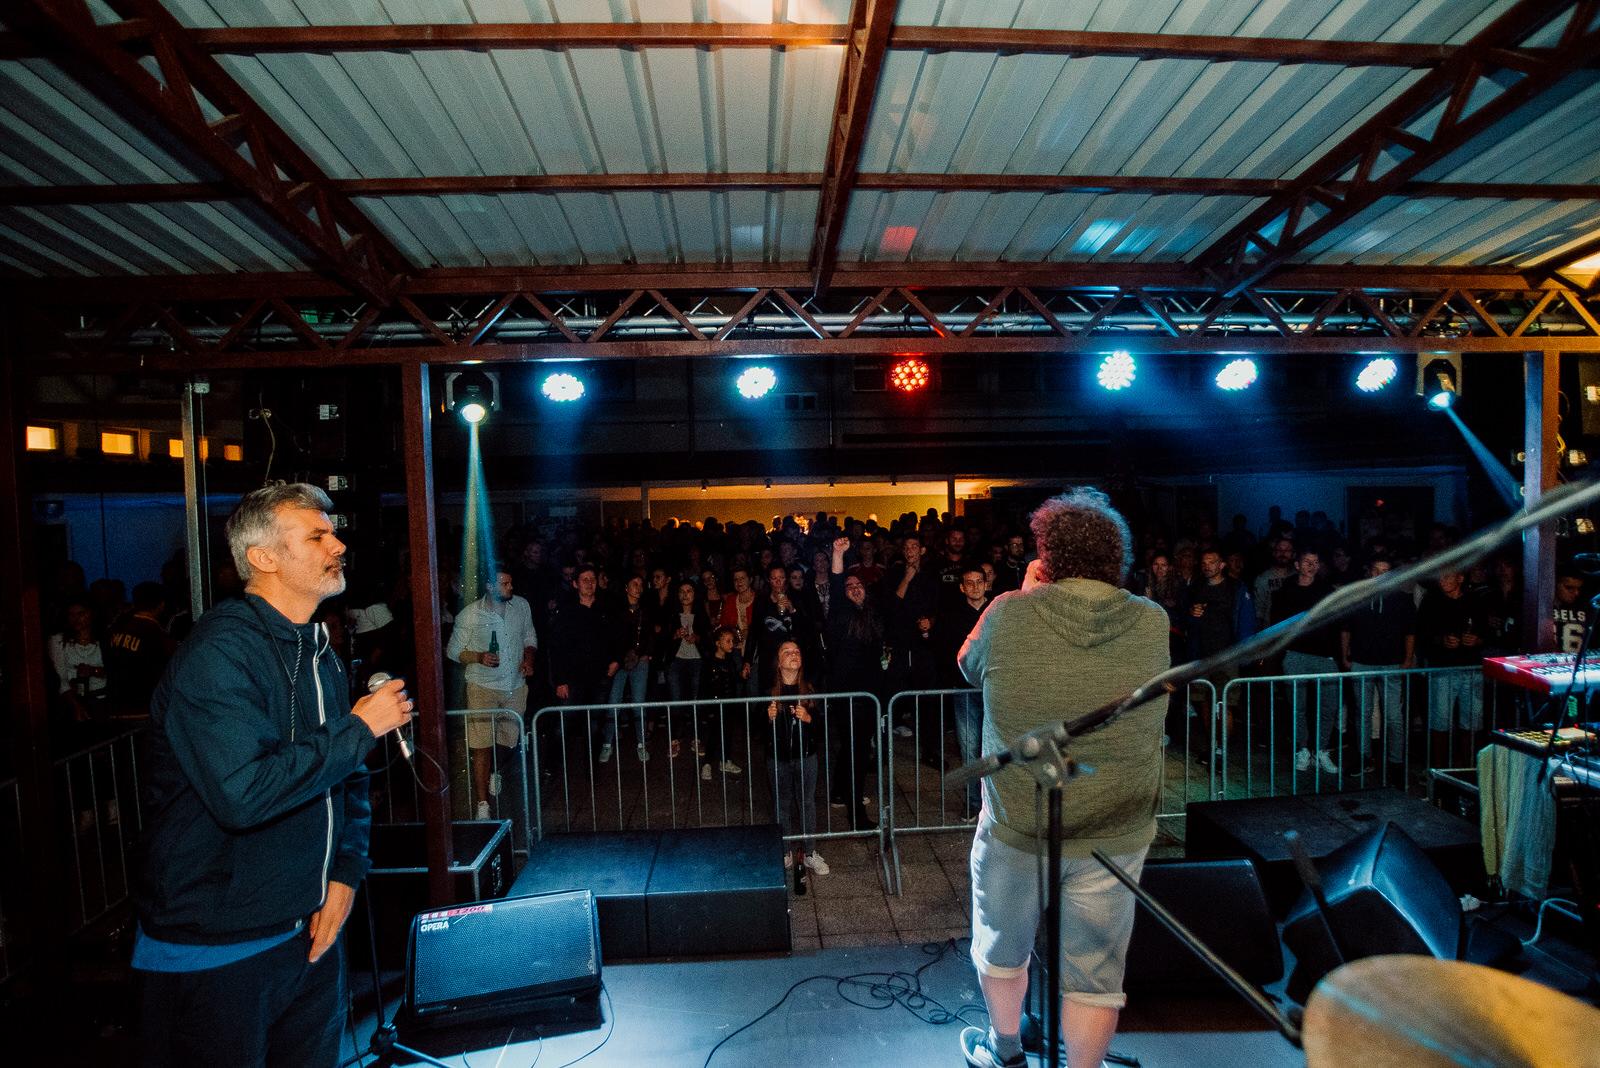 likaclub_grocks-2019_tbf-barbara-munjas-23